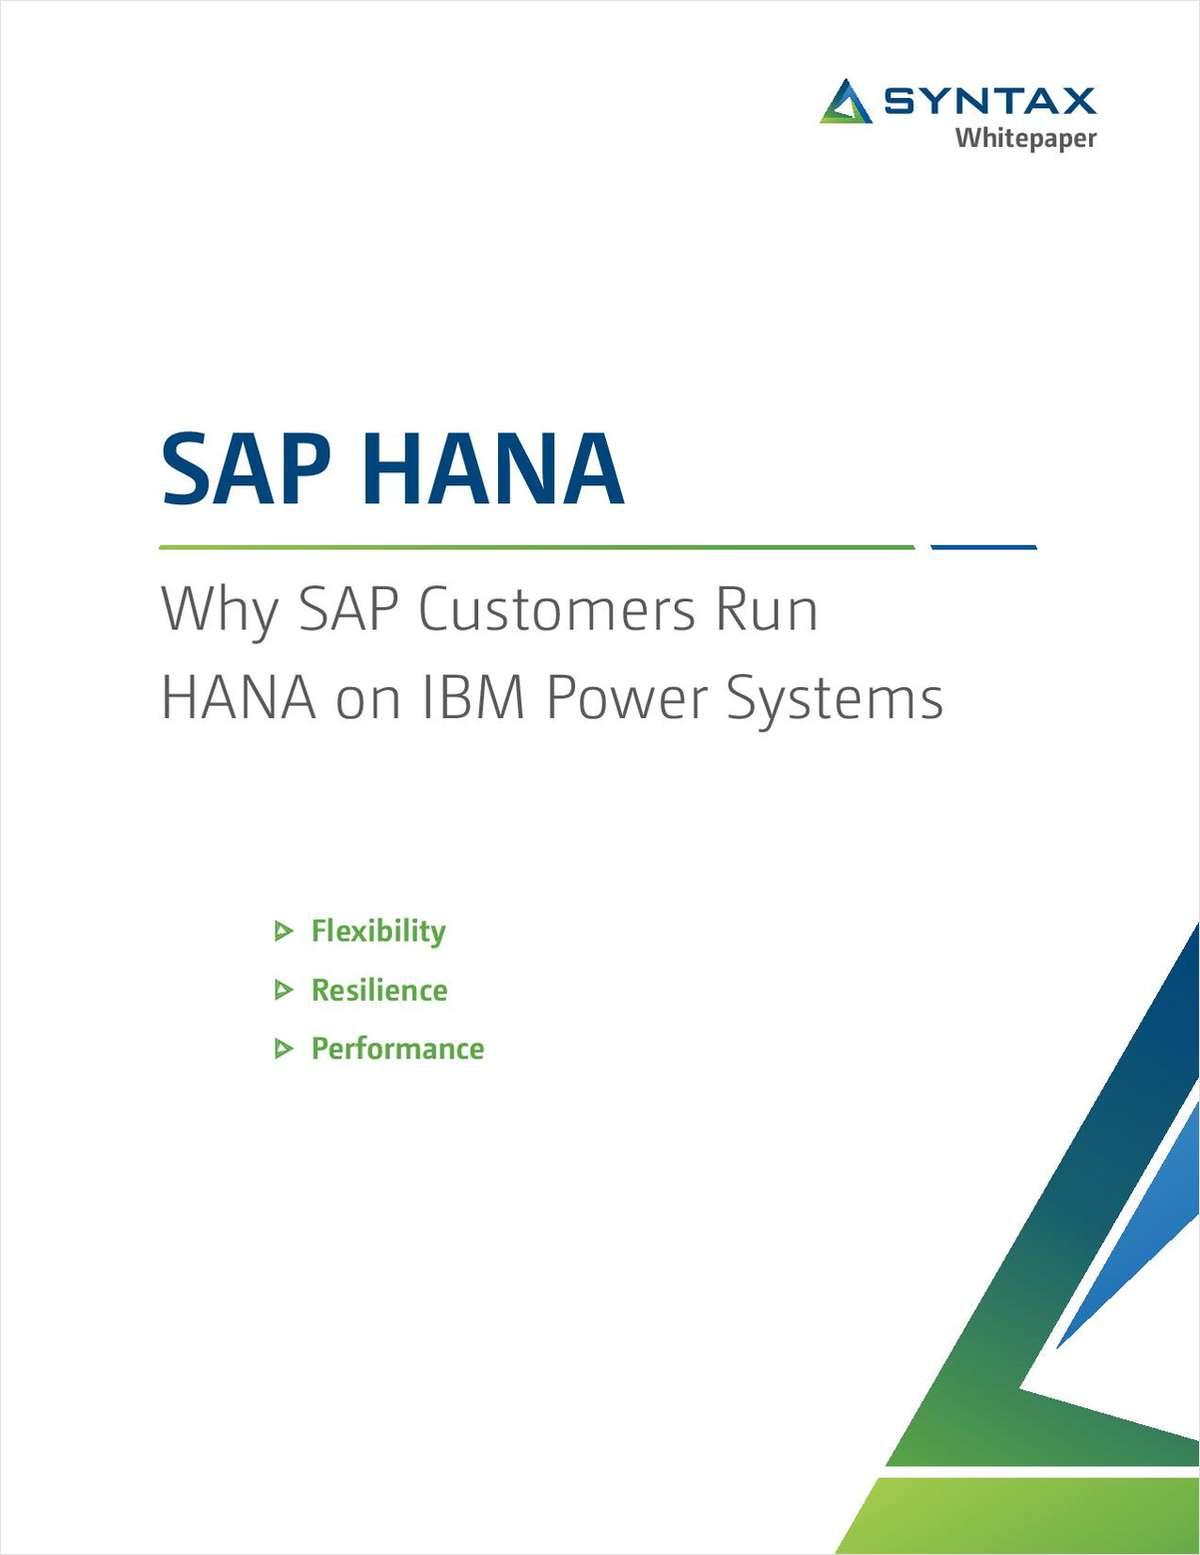 SAP HANA: Why SAP Customers Run HANA on IBM Power Systems